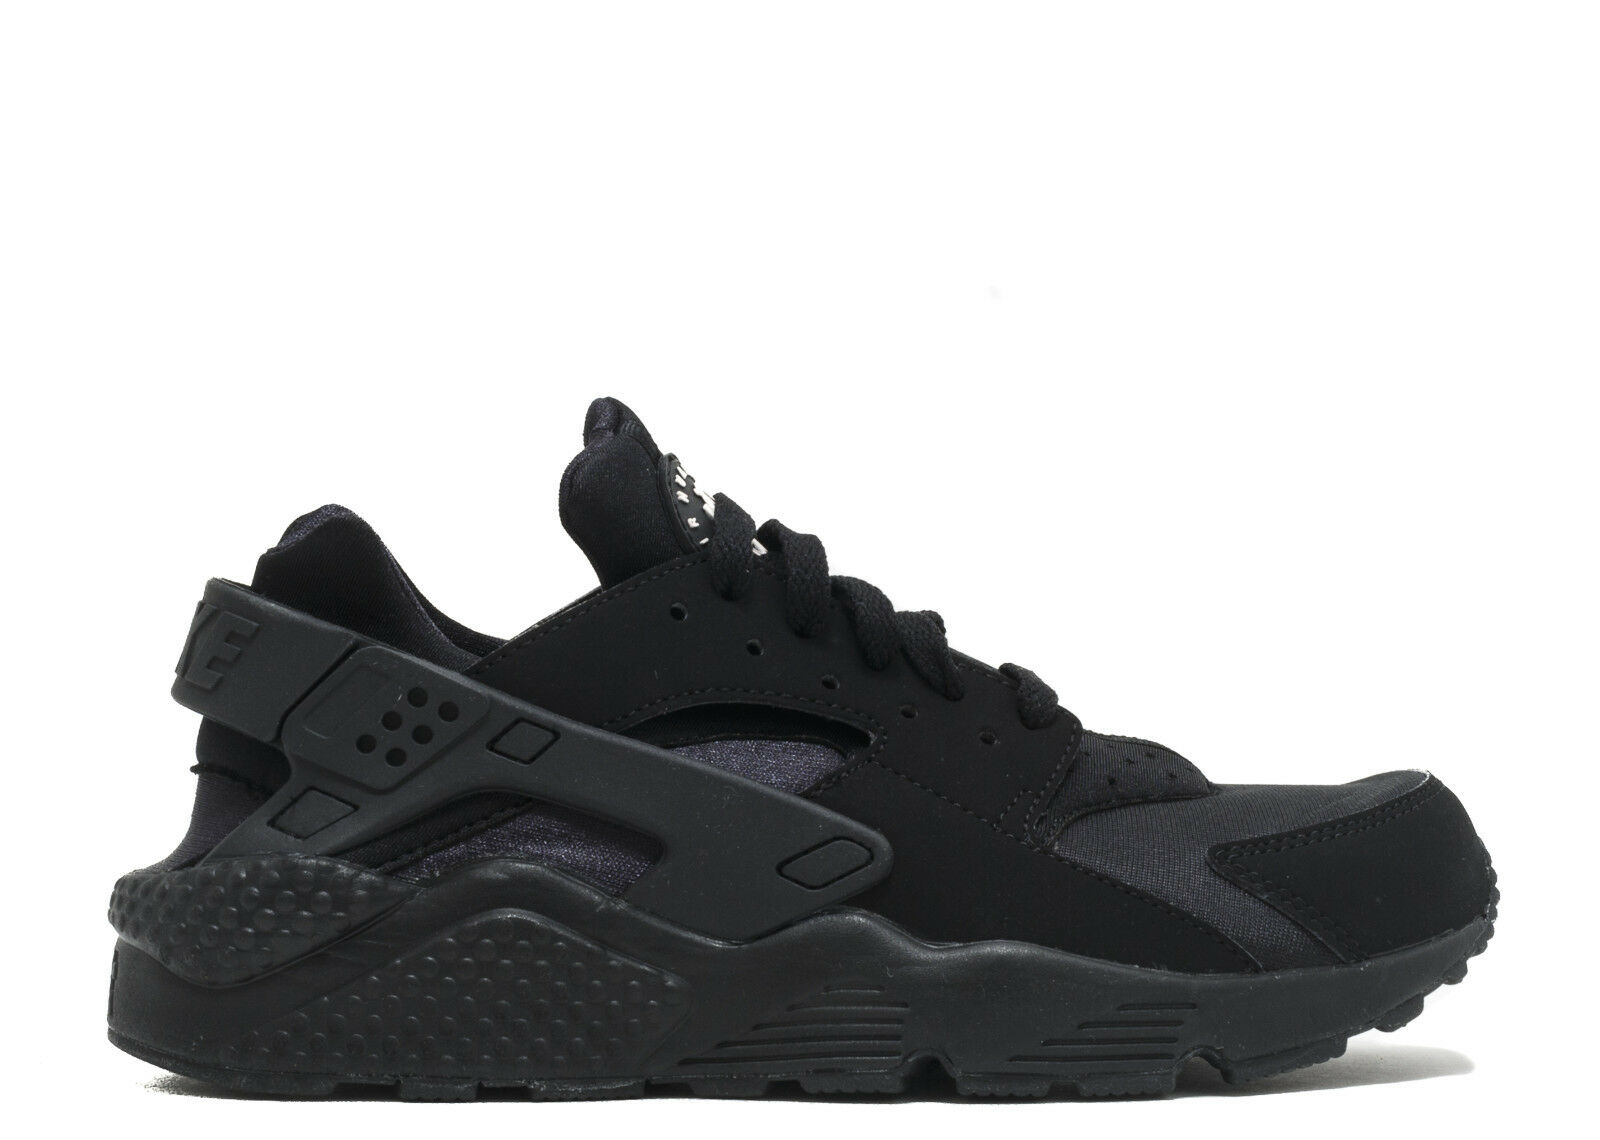 New Nike Air huarache M Men Black 318429-003 Running Shoes Men M 0ee7d1